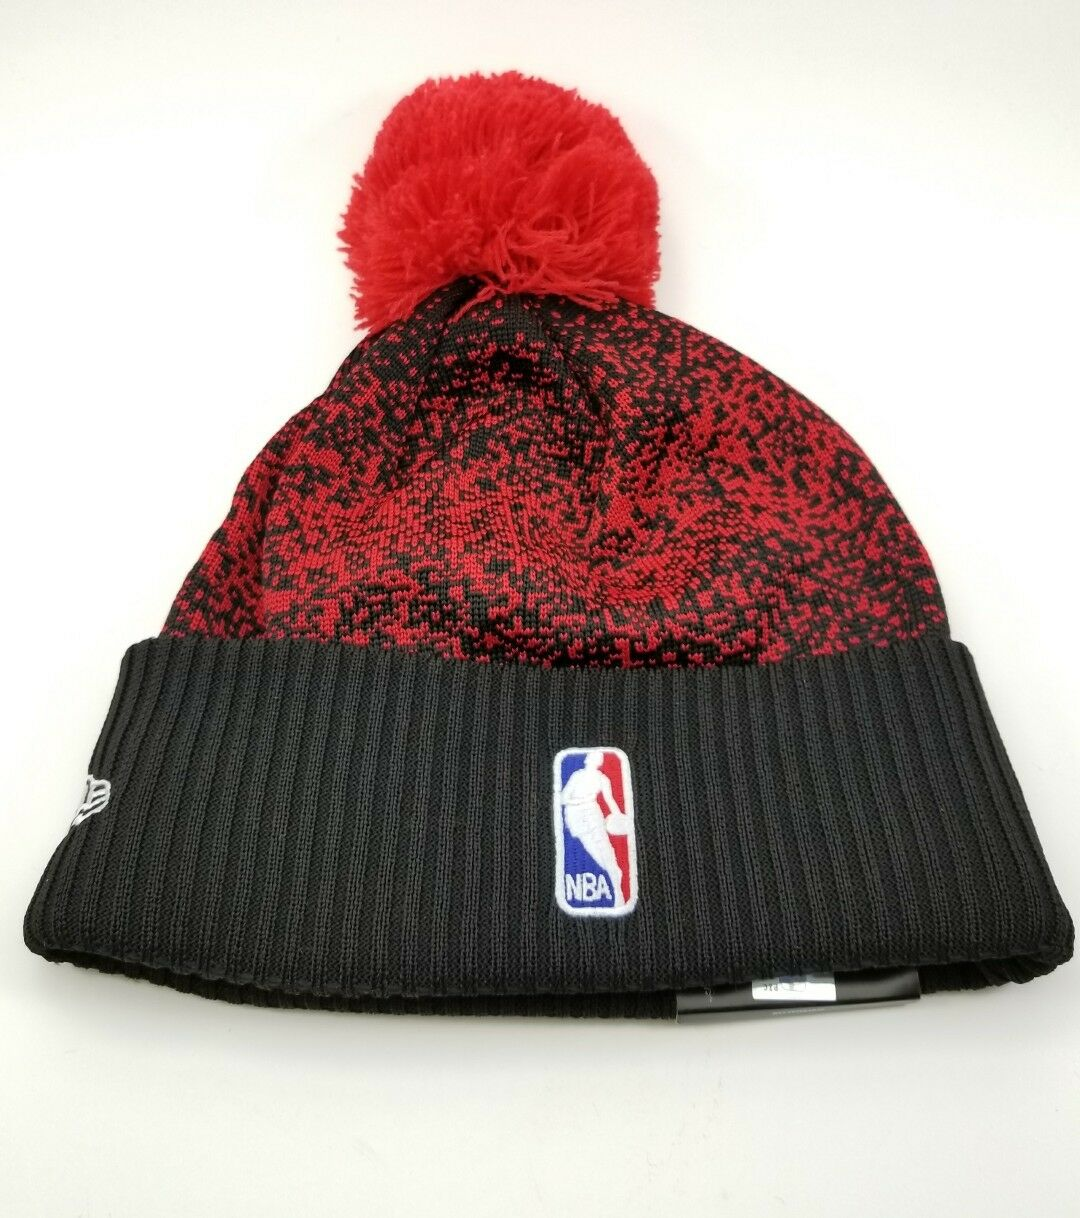 495e978cf Era NBA Bobble Toronto Raptors 2017 on Court Sports Knit Sideline Beanie Hat